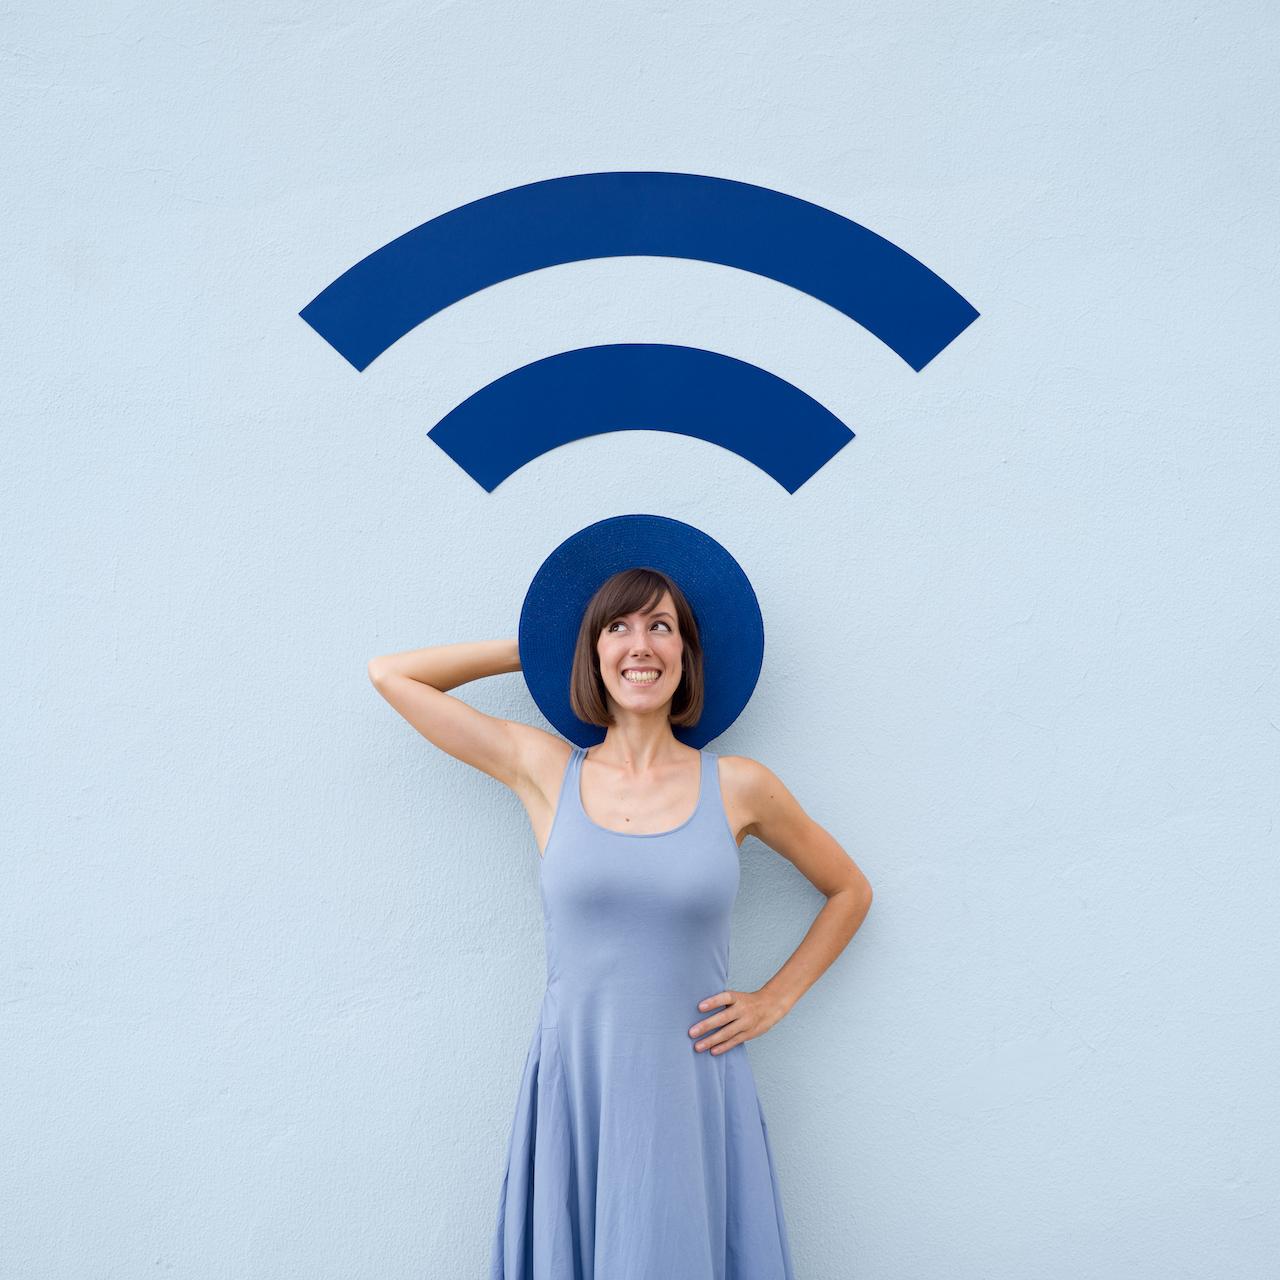 Annandaniel Anniset DrCuerda Anna Devís Daniel Rueda Papertastic Wifi Hatspot Personal Hotspot Internet Icon Illustration Wi-fi